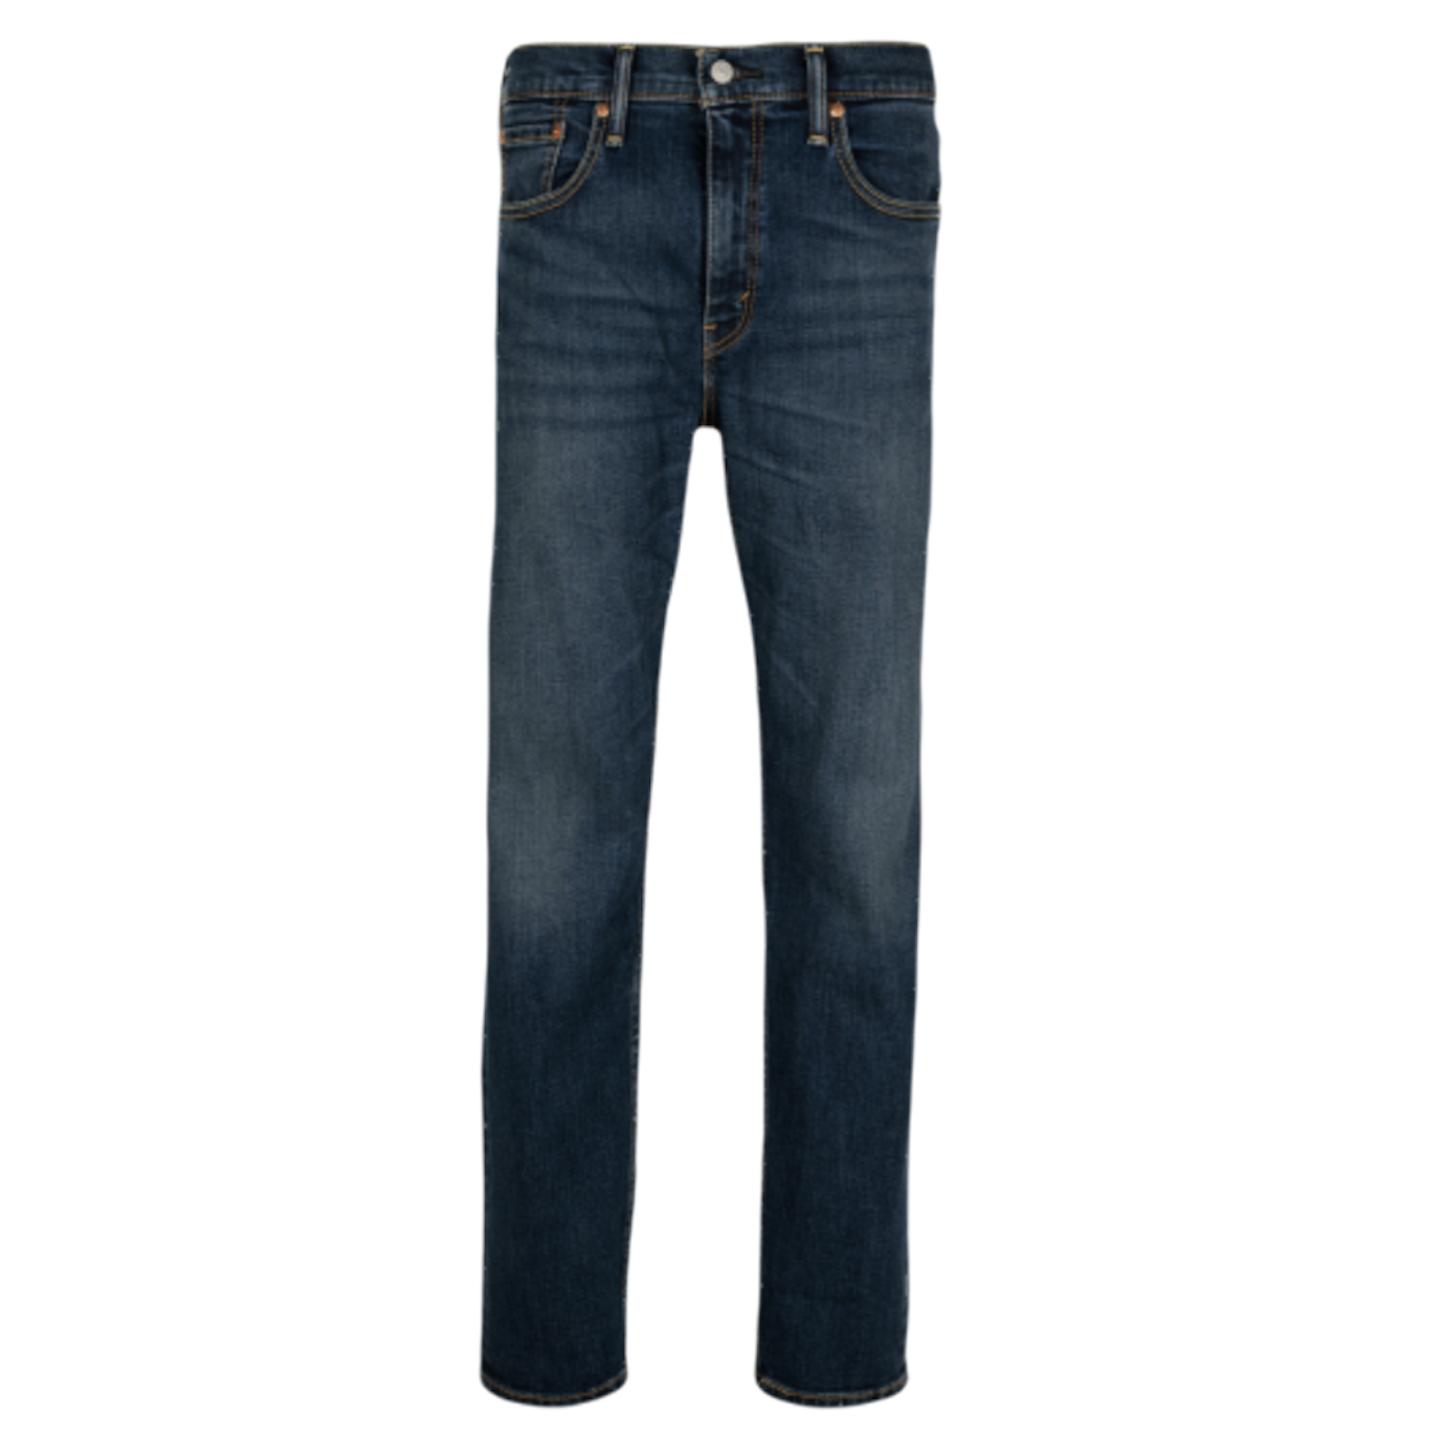 Levi's 李维斯 经典五袋款系列男士棉质锥型牛仔长裤29507-0053 蓝色32